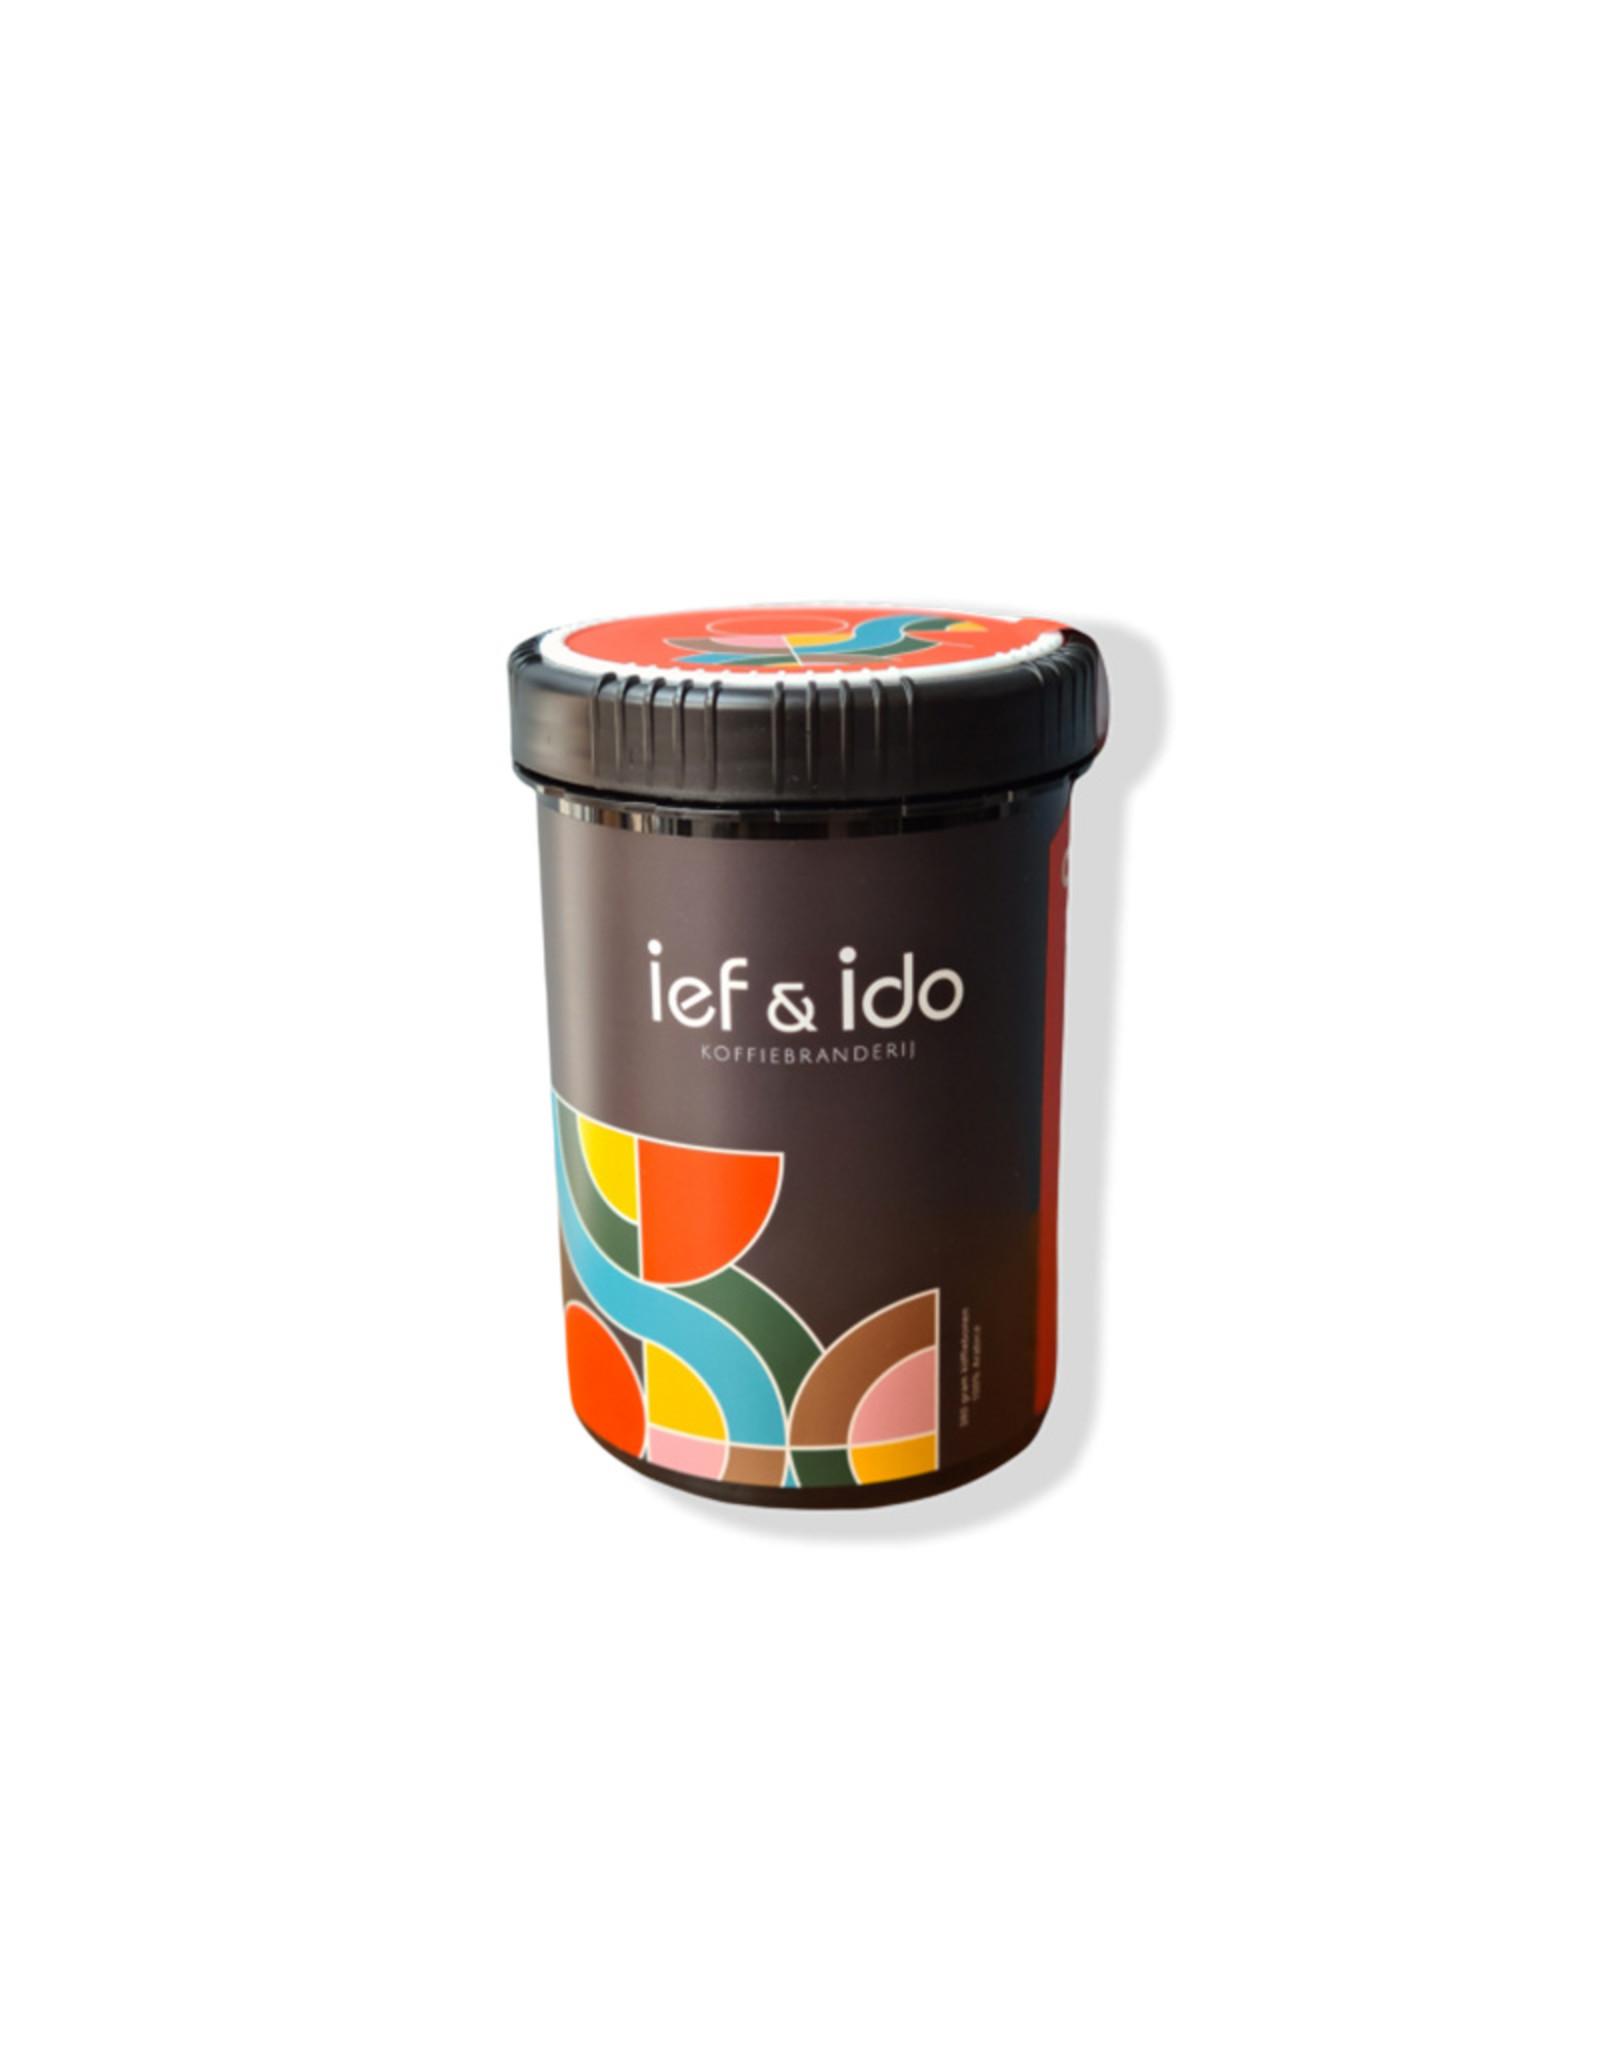 Ief & Ido Ief & Ido - Colombia